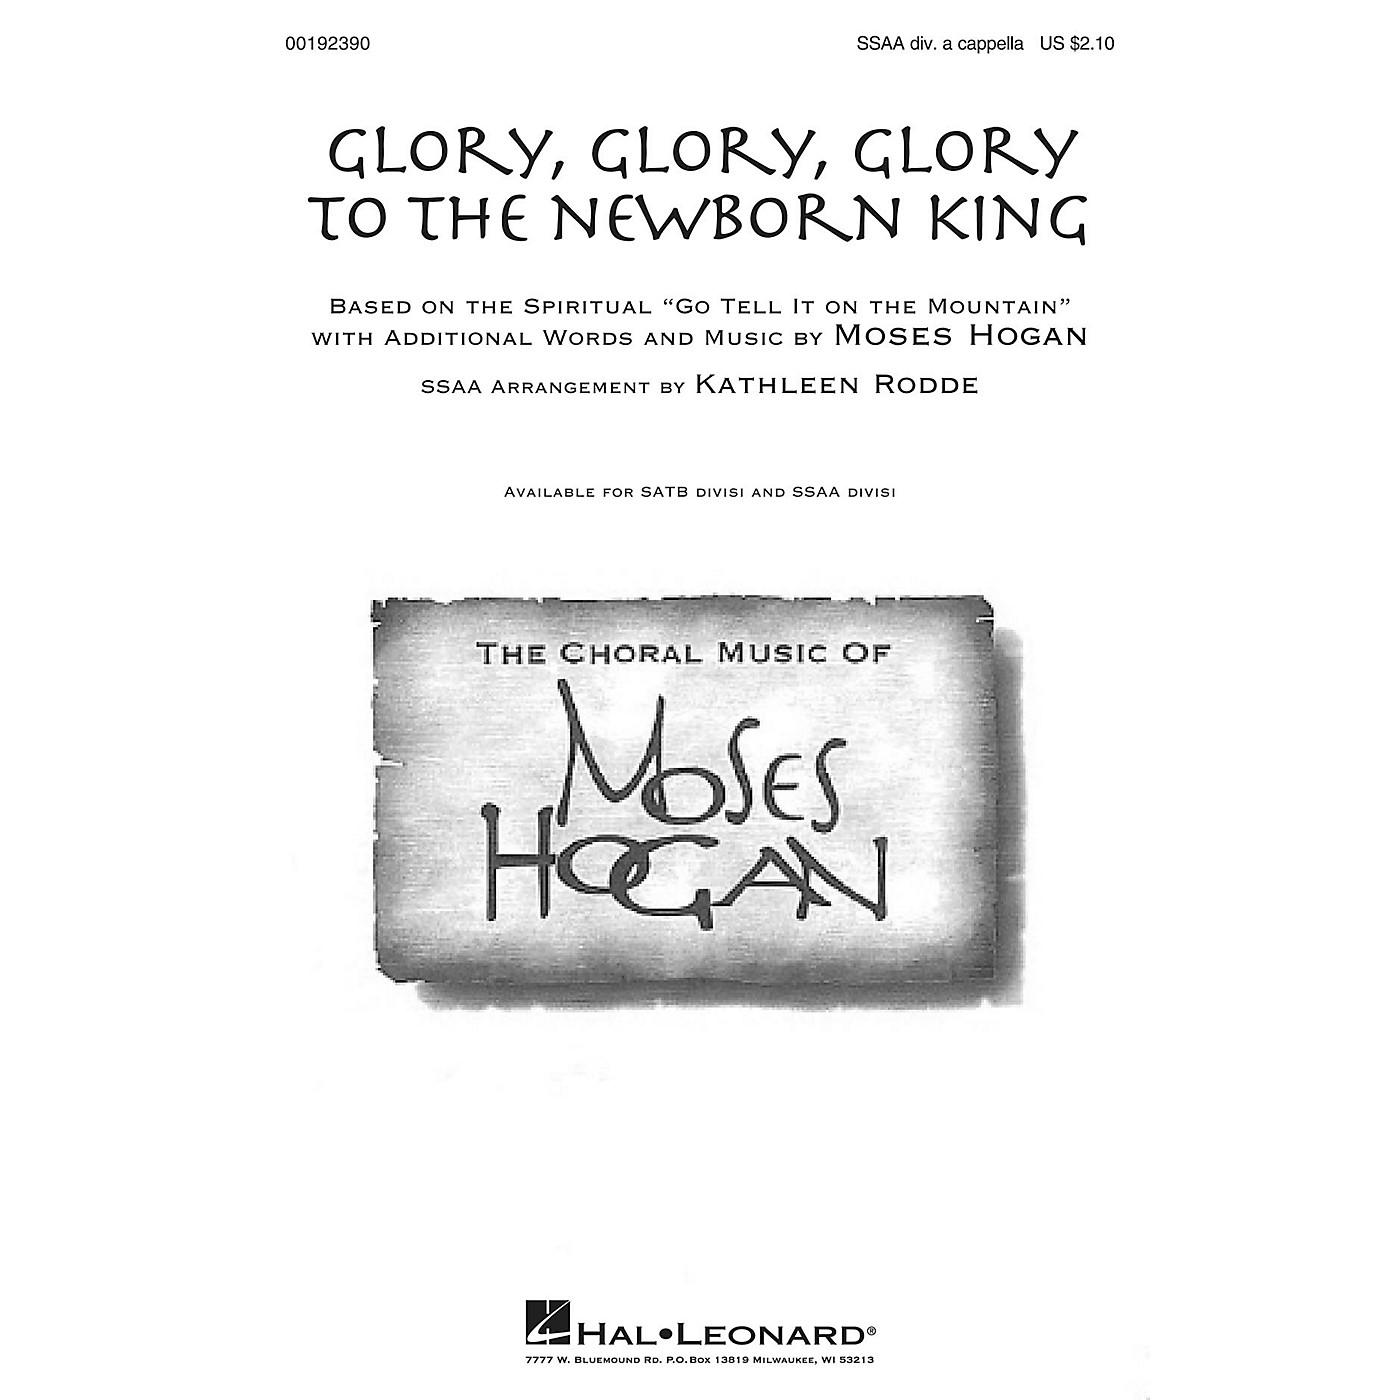 Hal Leonard Glory, Glory, Glory to the Newborn King SSAA Div A Cappella arranged by Kathleen Rodde thumbnail